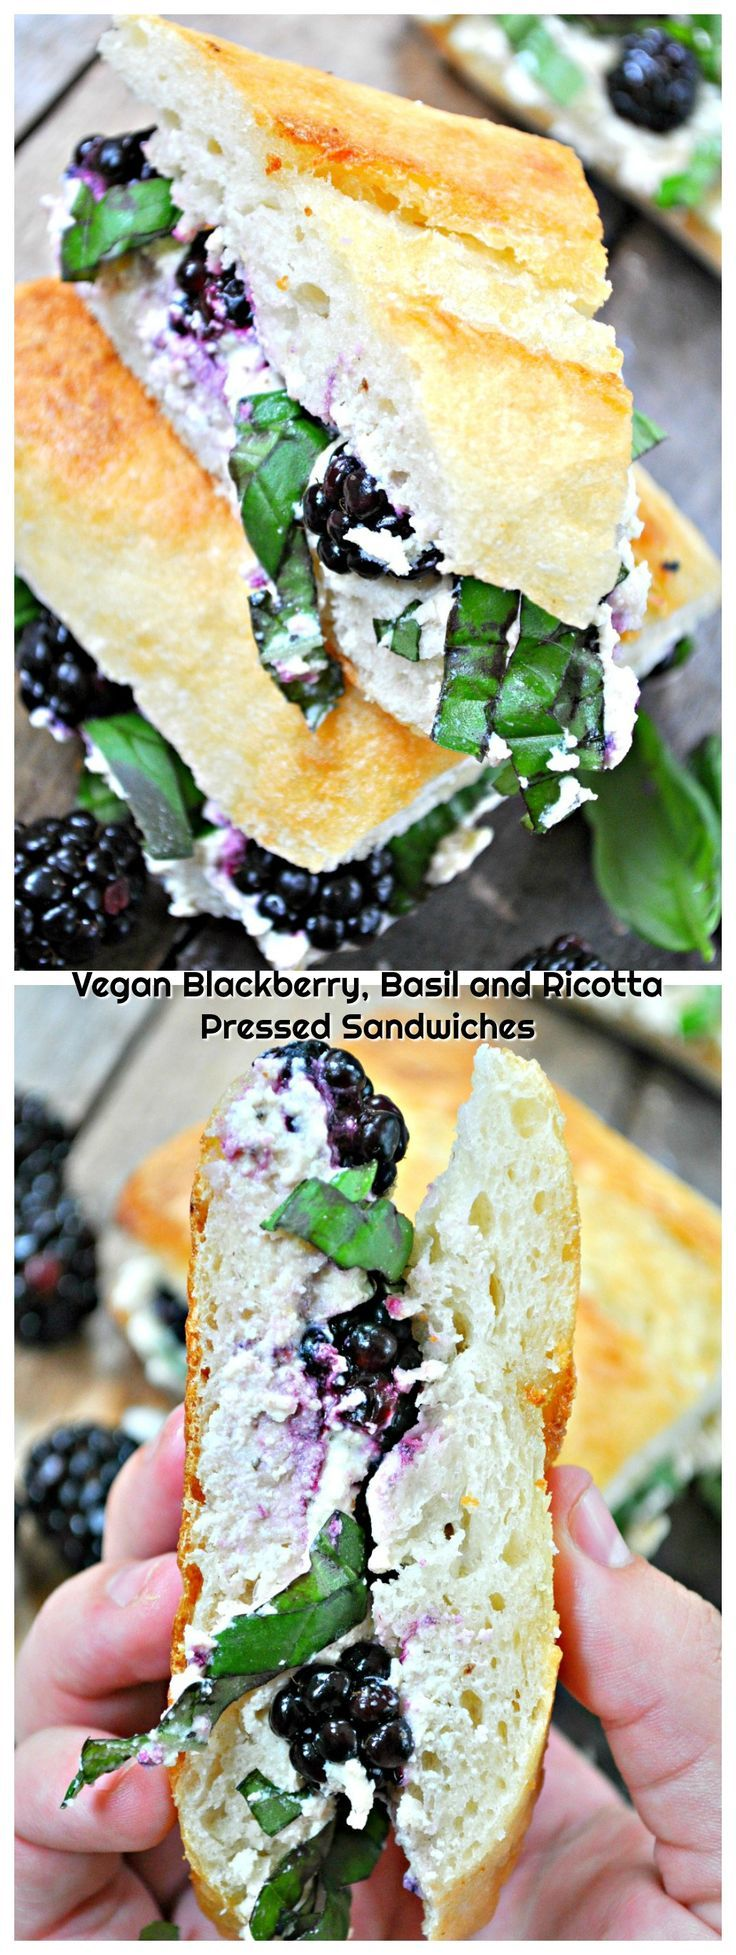 Vegan Blackberry, Basil and Ricotta Pressed Sandwich